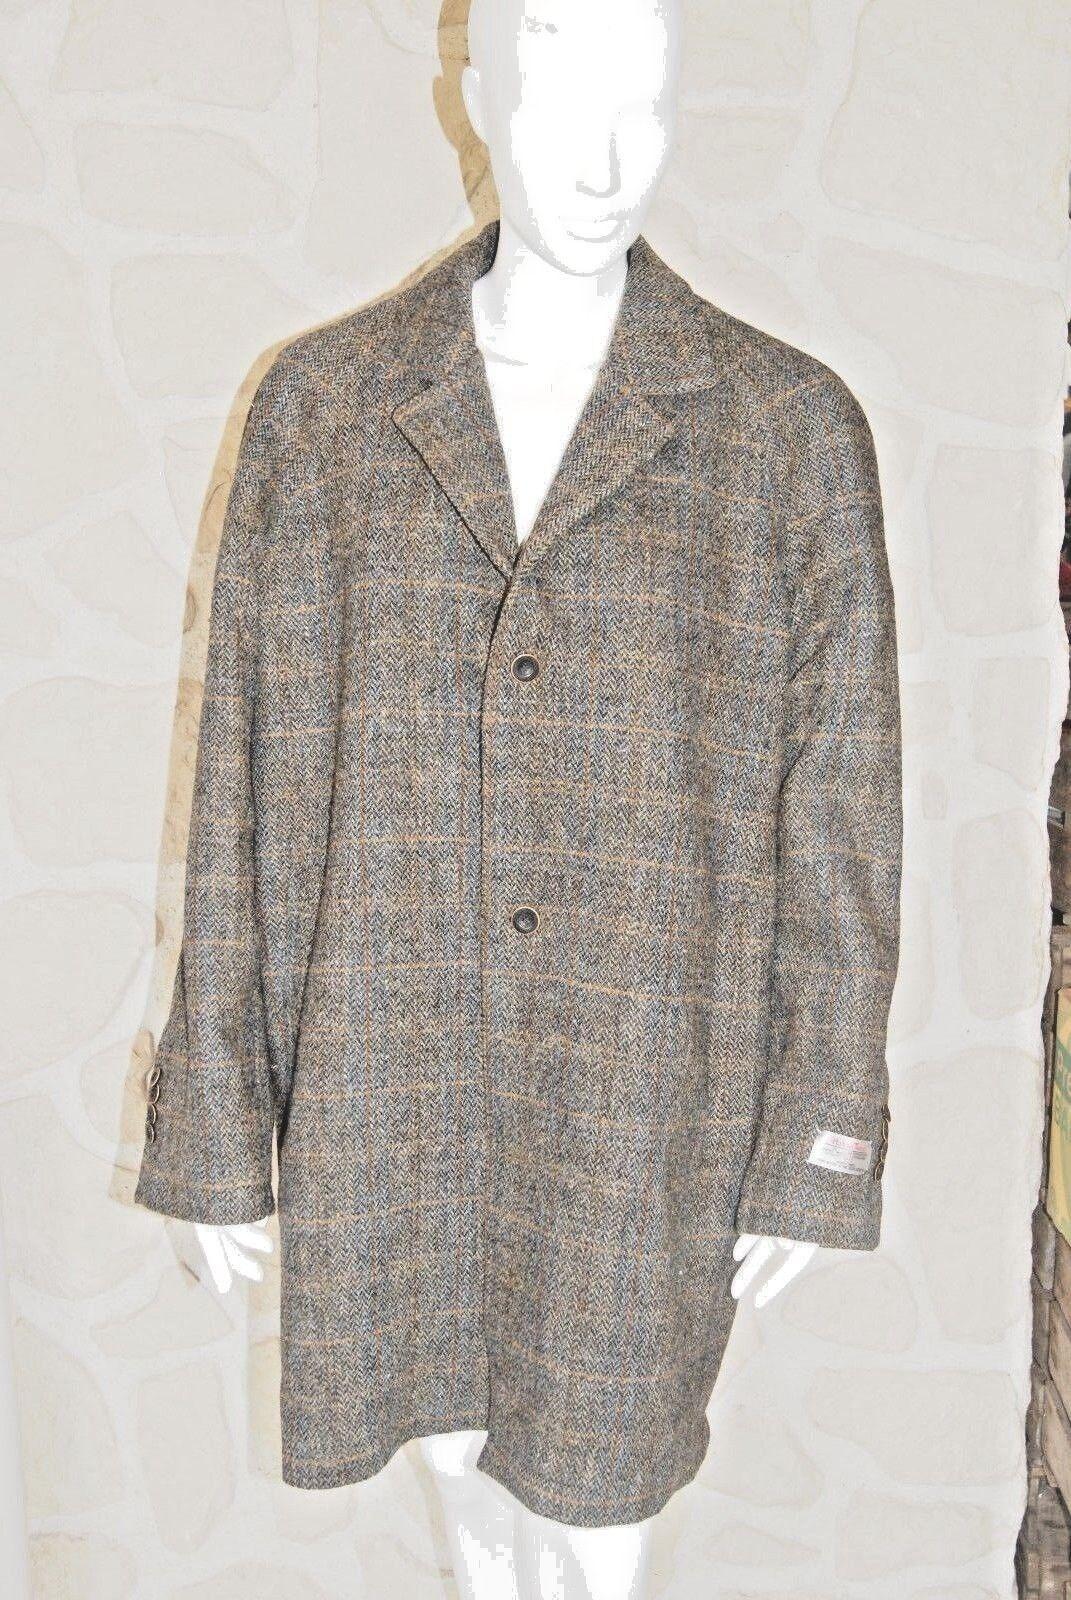 Manteau pure laine neuve taille 52-54 EUR marque HARRIS TWEED